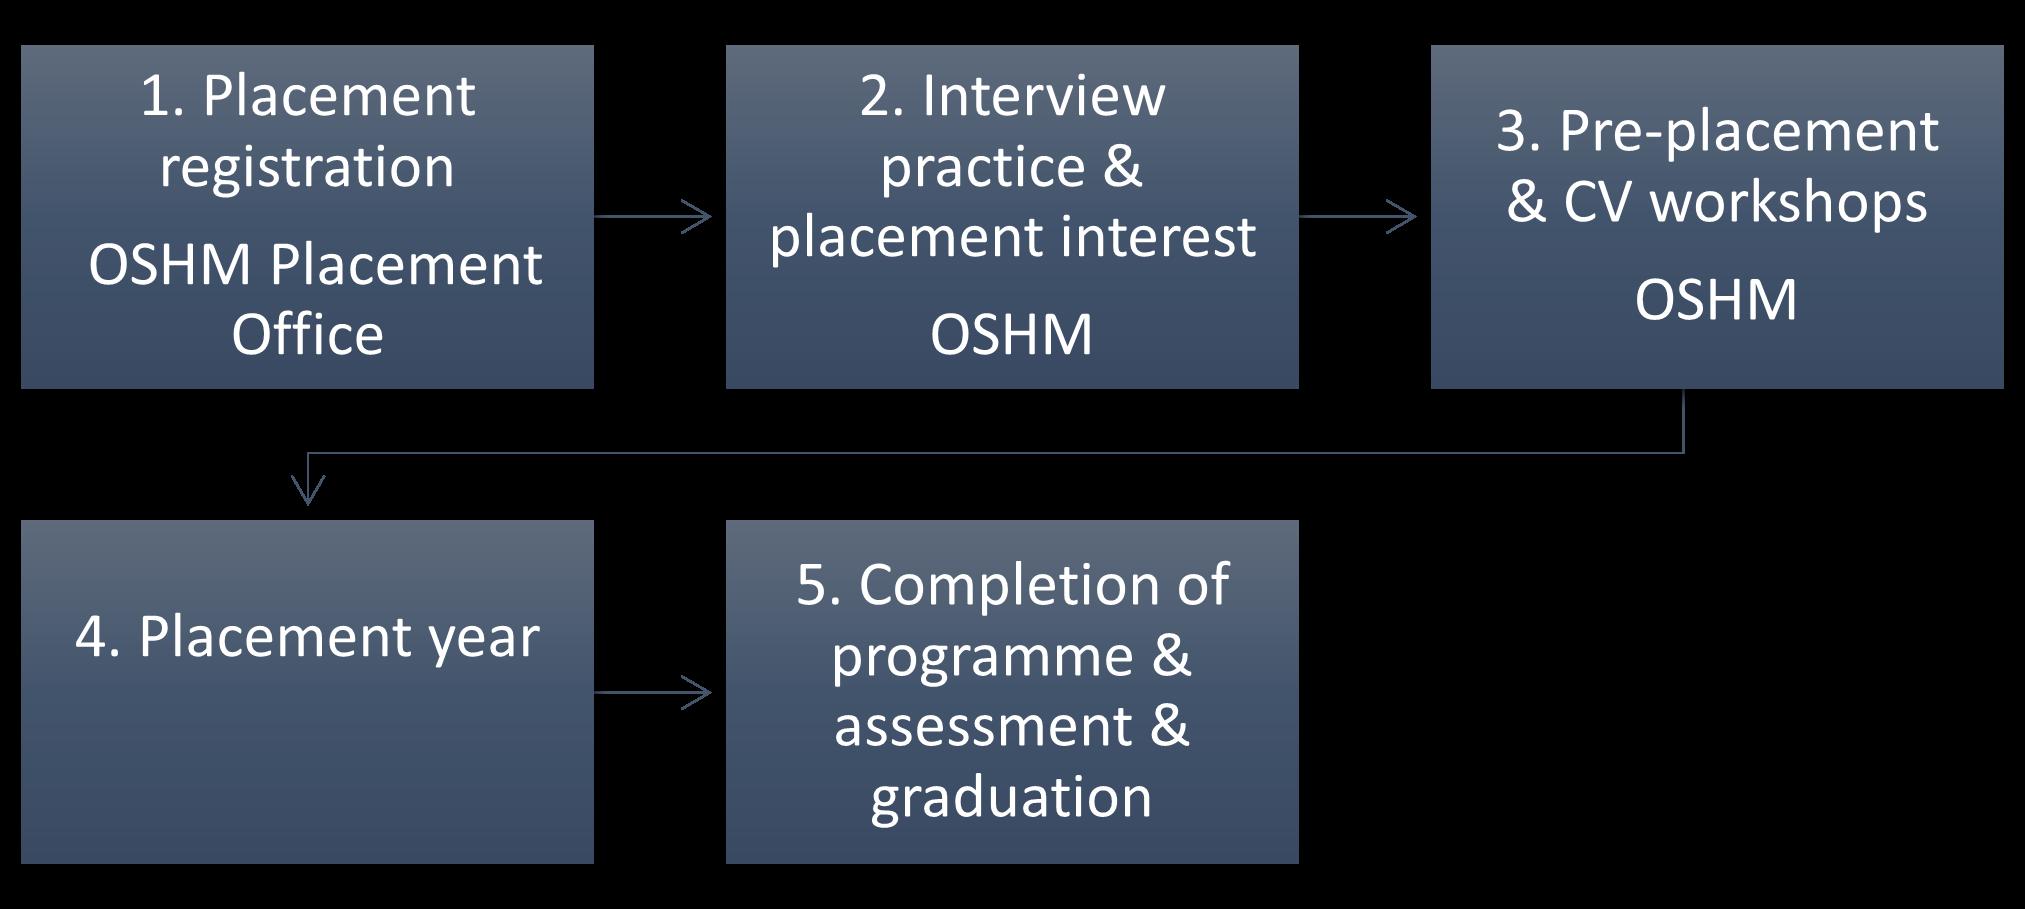 1. Placement registration OSM Placement Office. 2. Interview practice & placement interest OSHM 3. Pre-placement & CV workshops OSHM 4. Placement year 5. Completion of programme & assessment & graduation